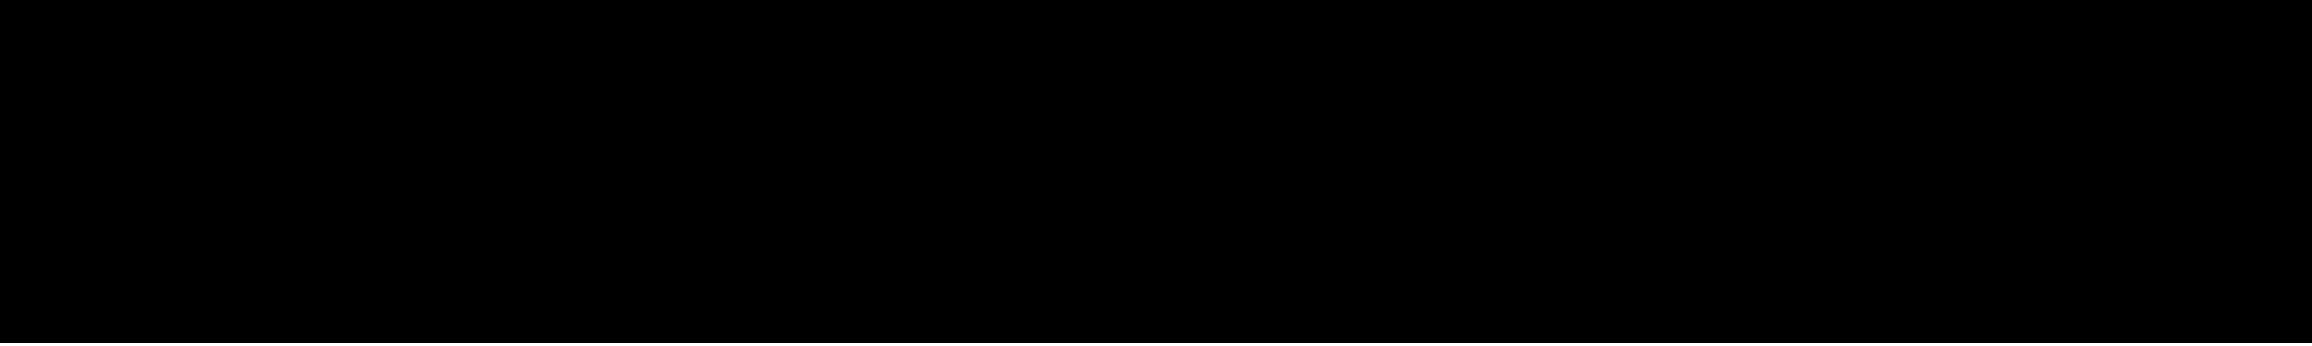 Carhifi-Berlin Nextbase products